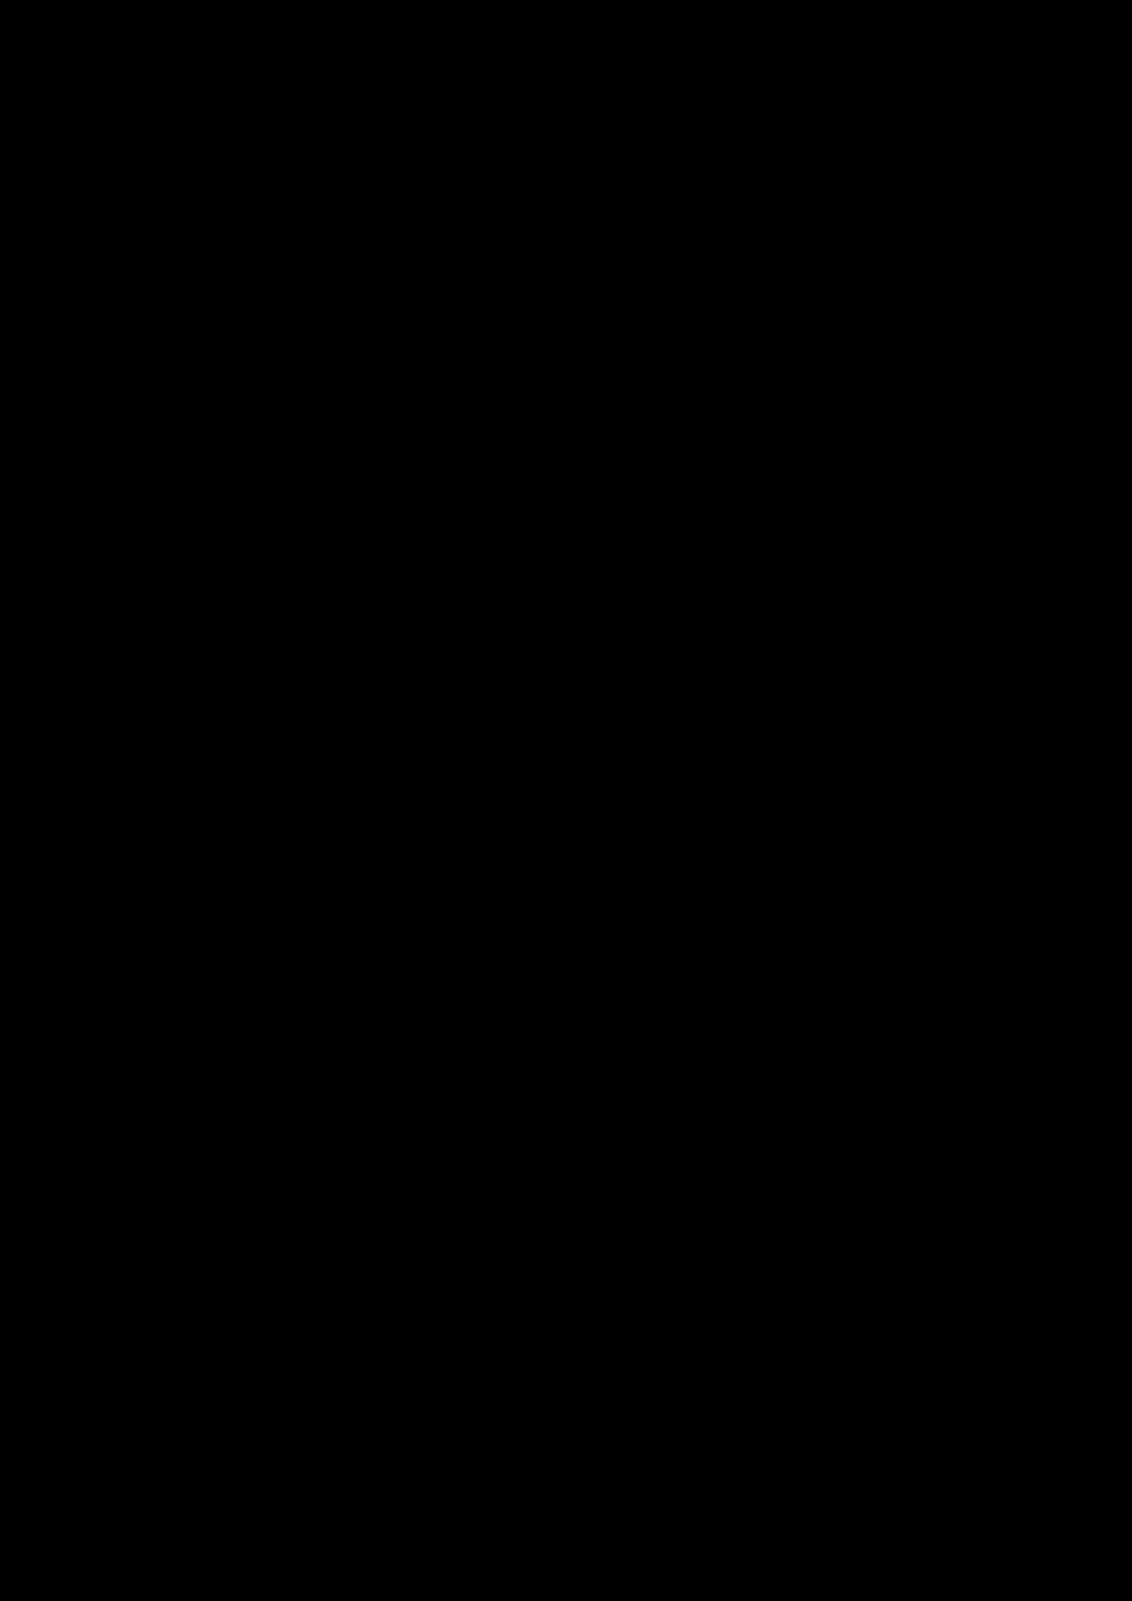 Korolevstvo slez slide, Image 55